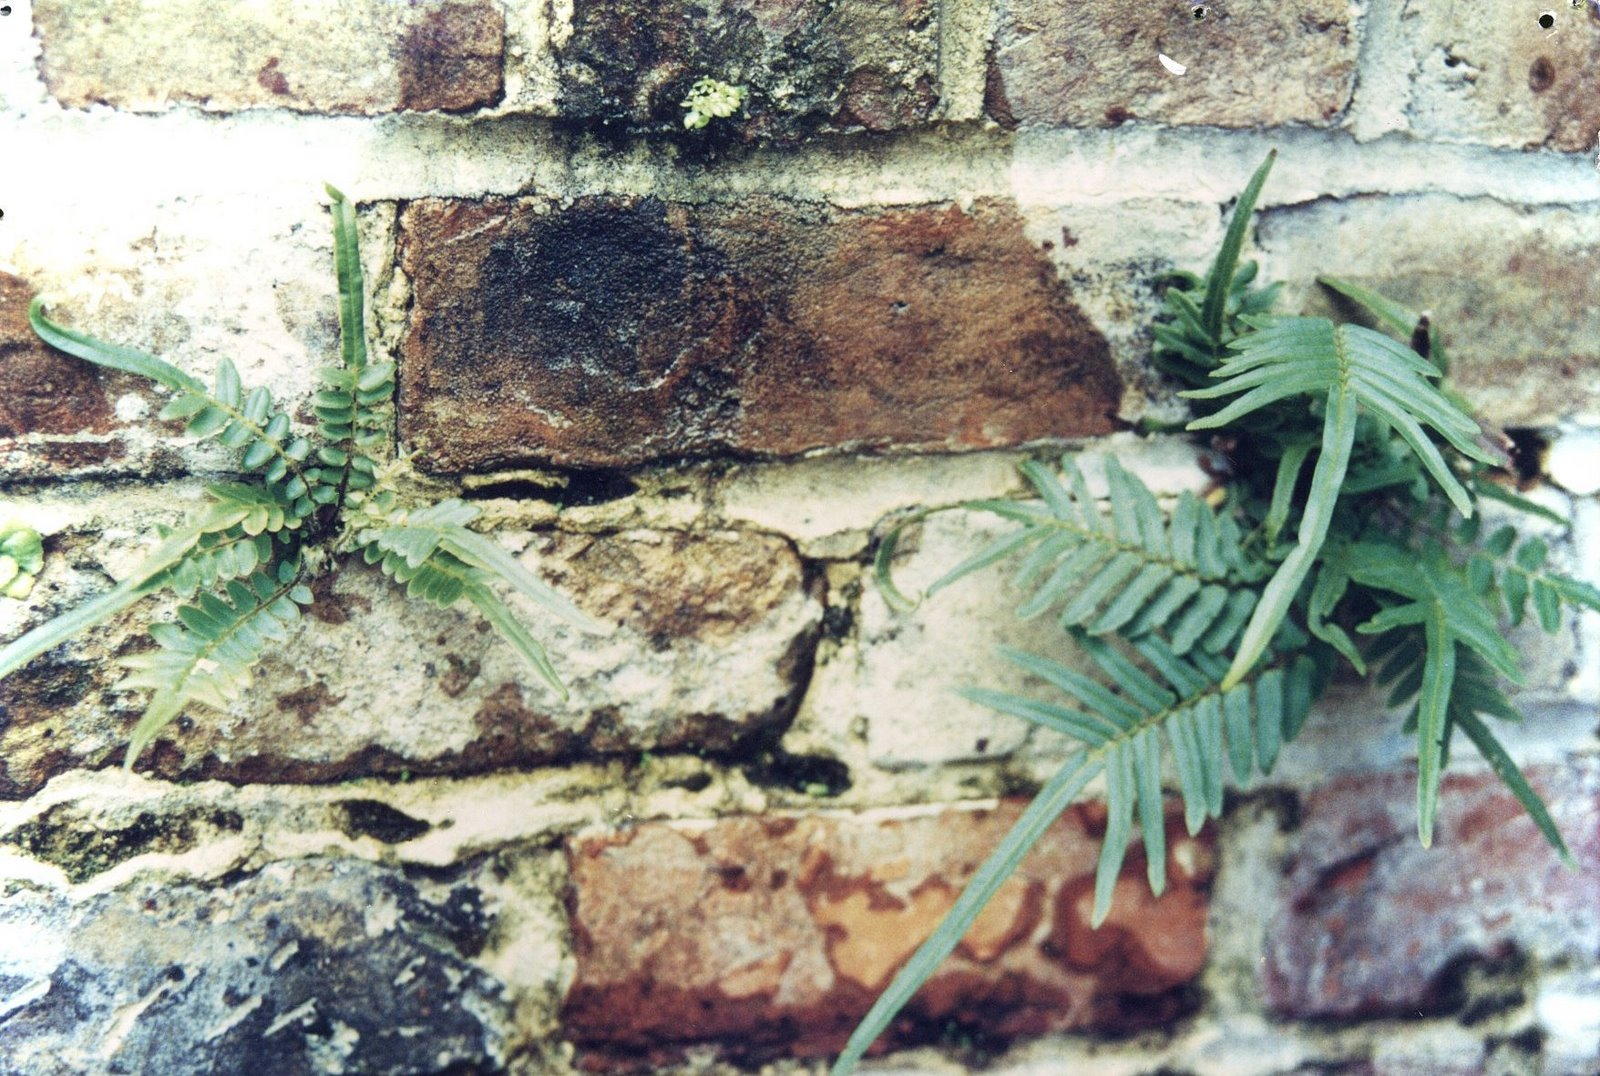 Resurrection Ferns